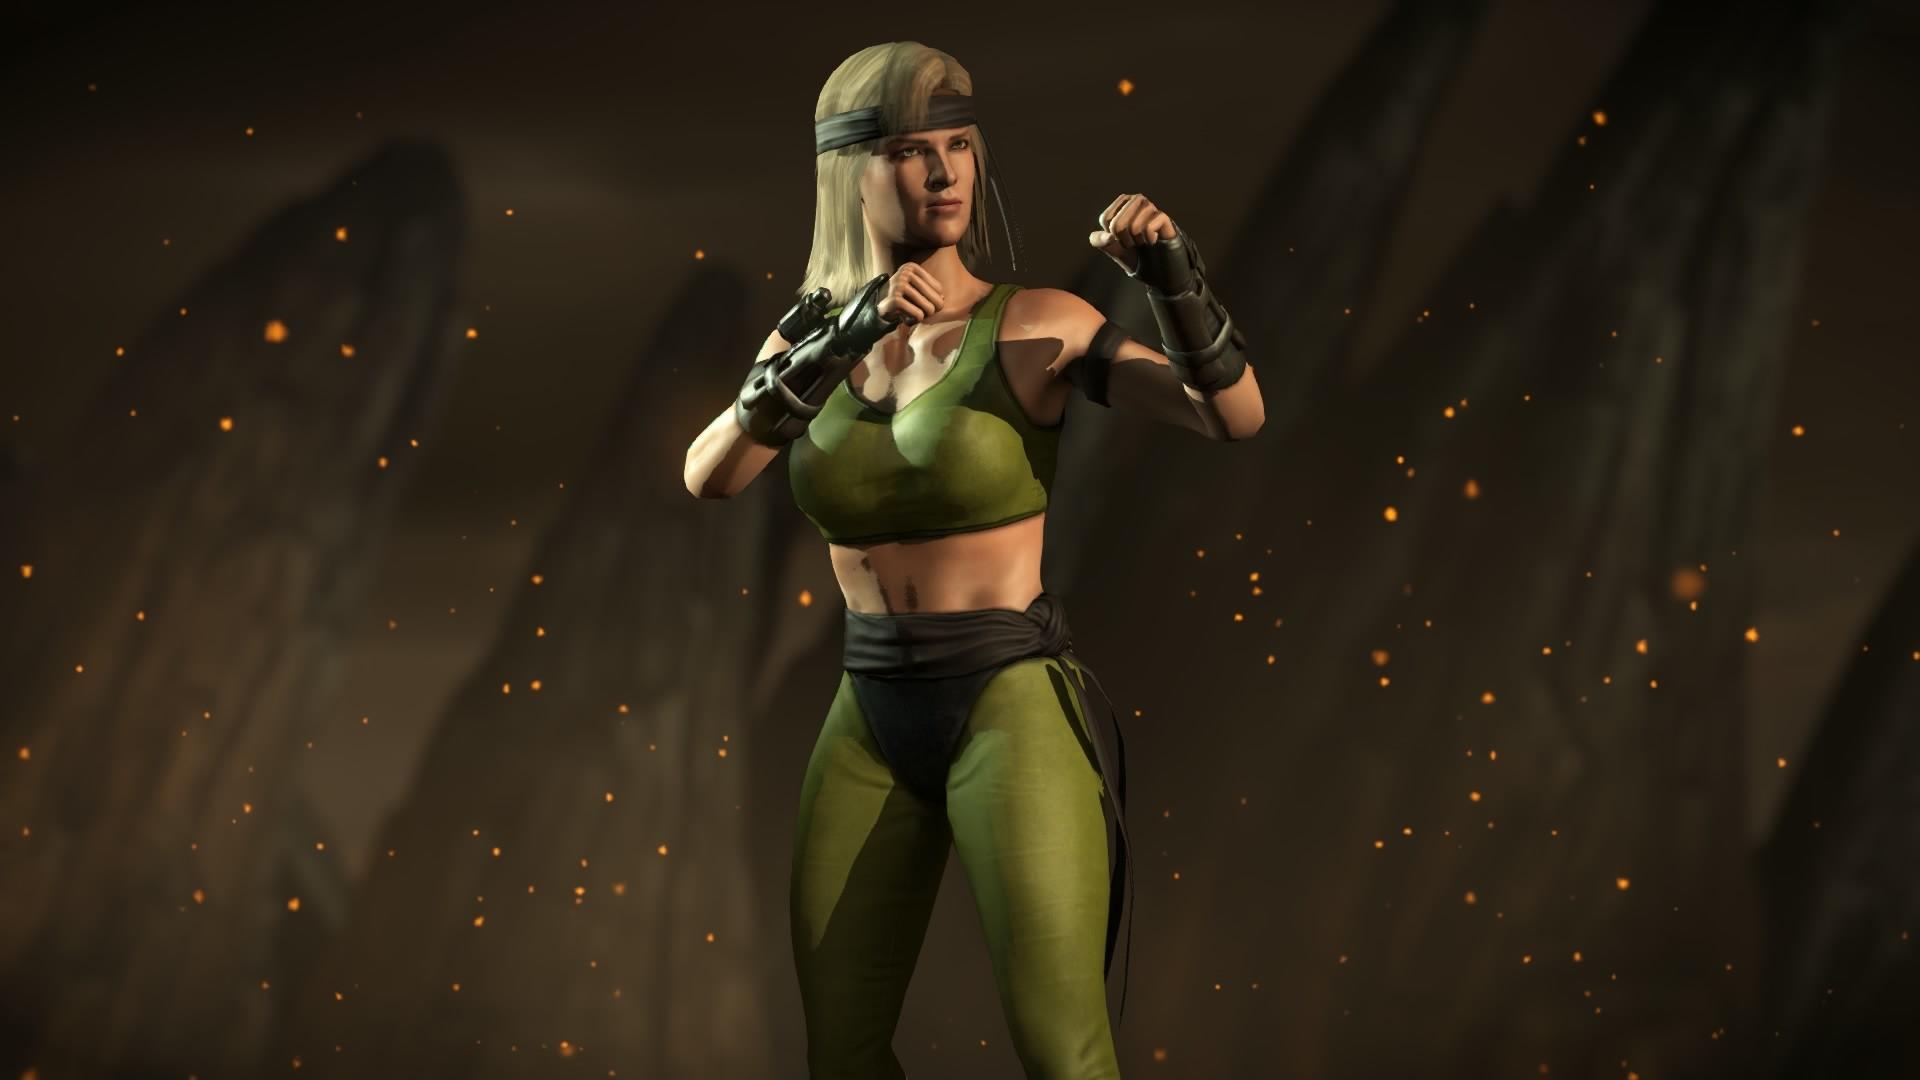 Mortal Kombat Sonya Blade Wallpaper 85 Images